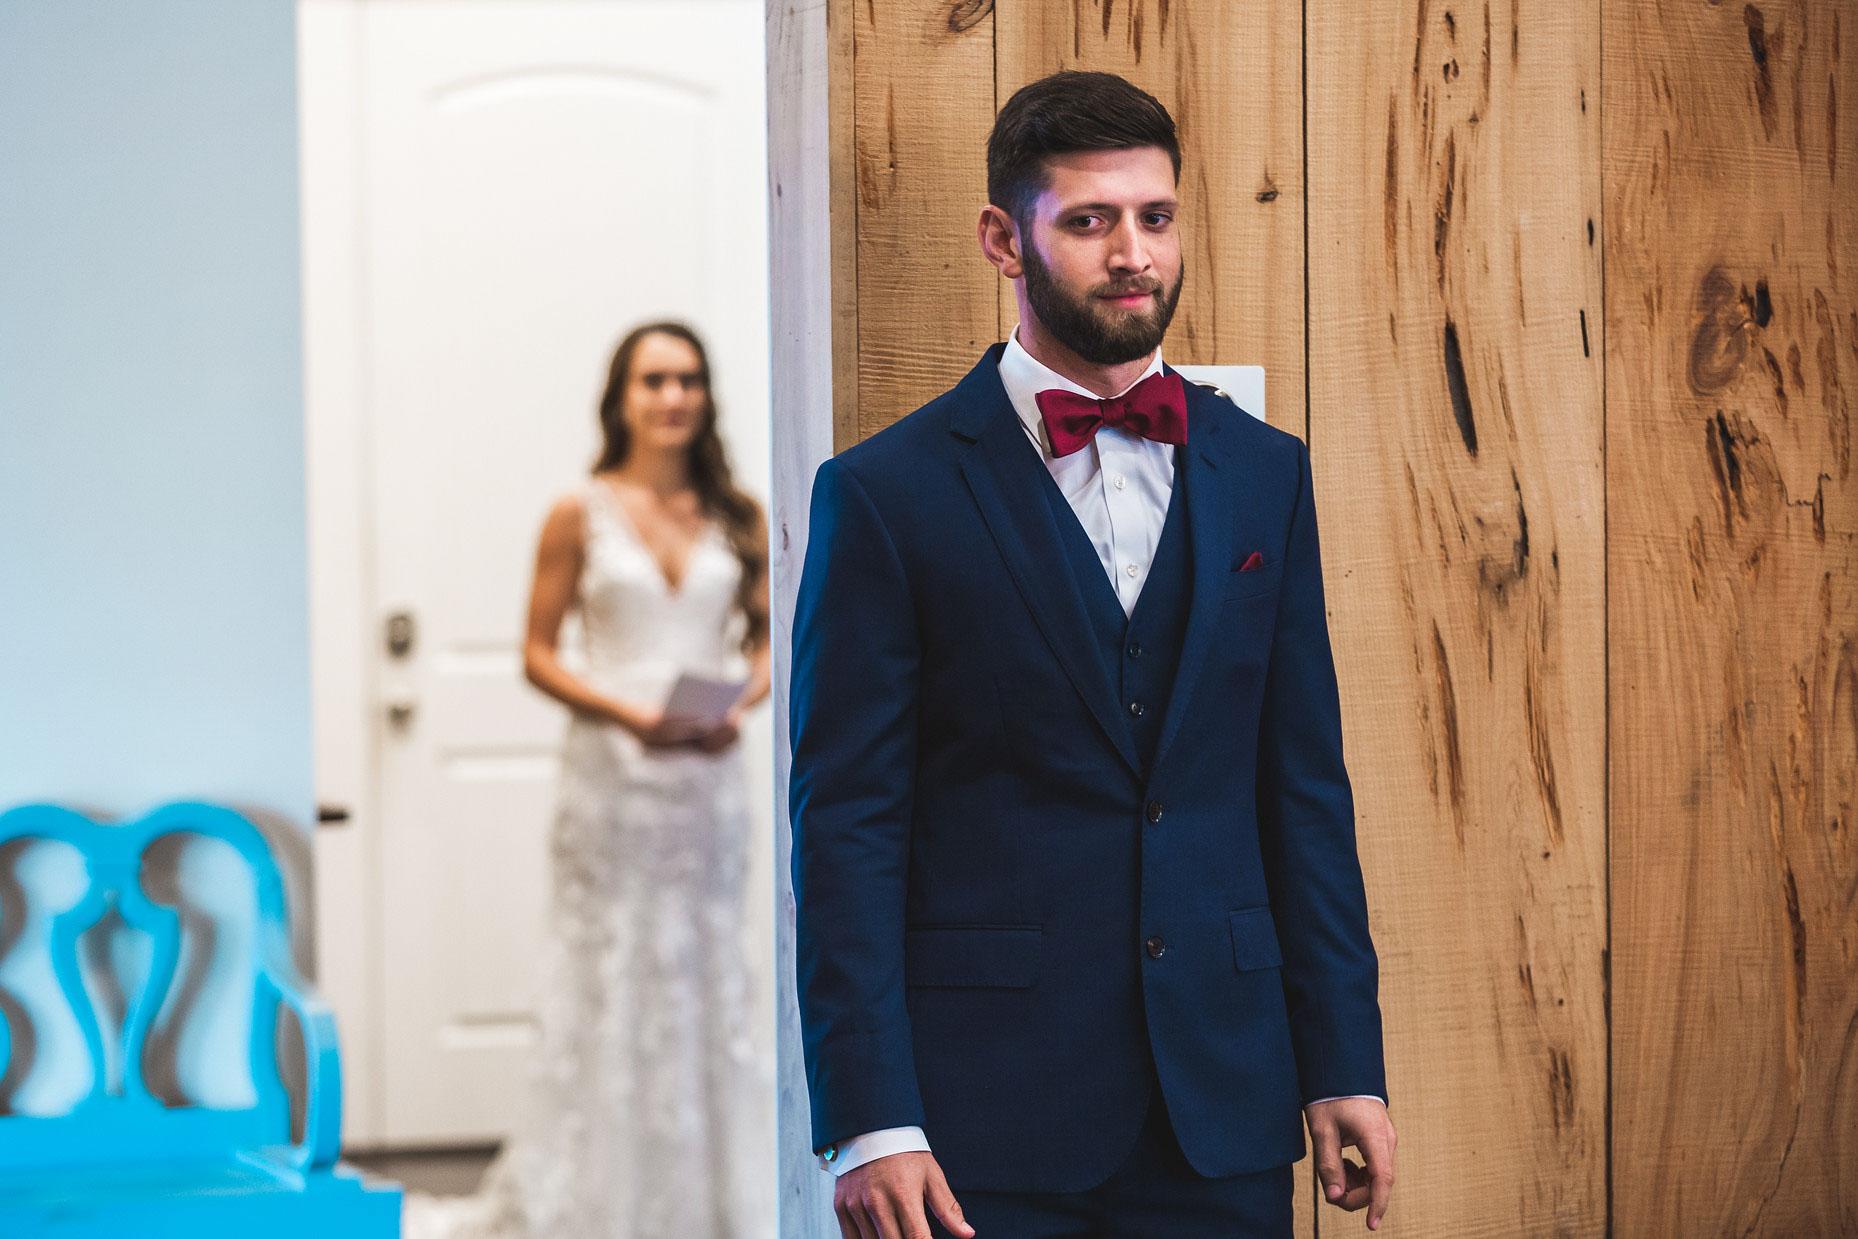 adam-szarmack-bowing-oaks-wedding-photographer-jacksonville-66.jpg